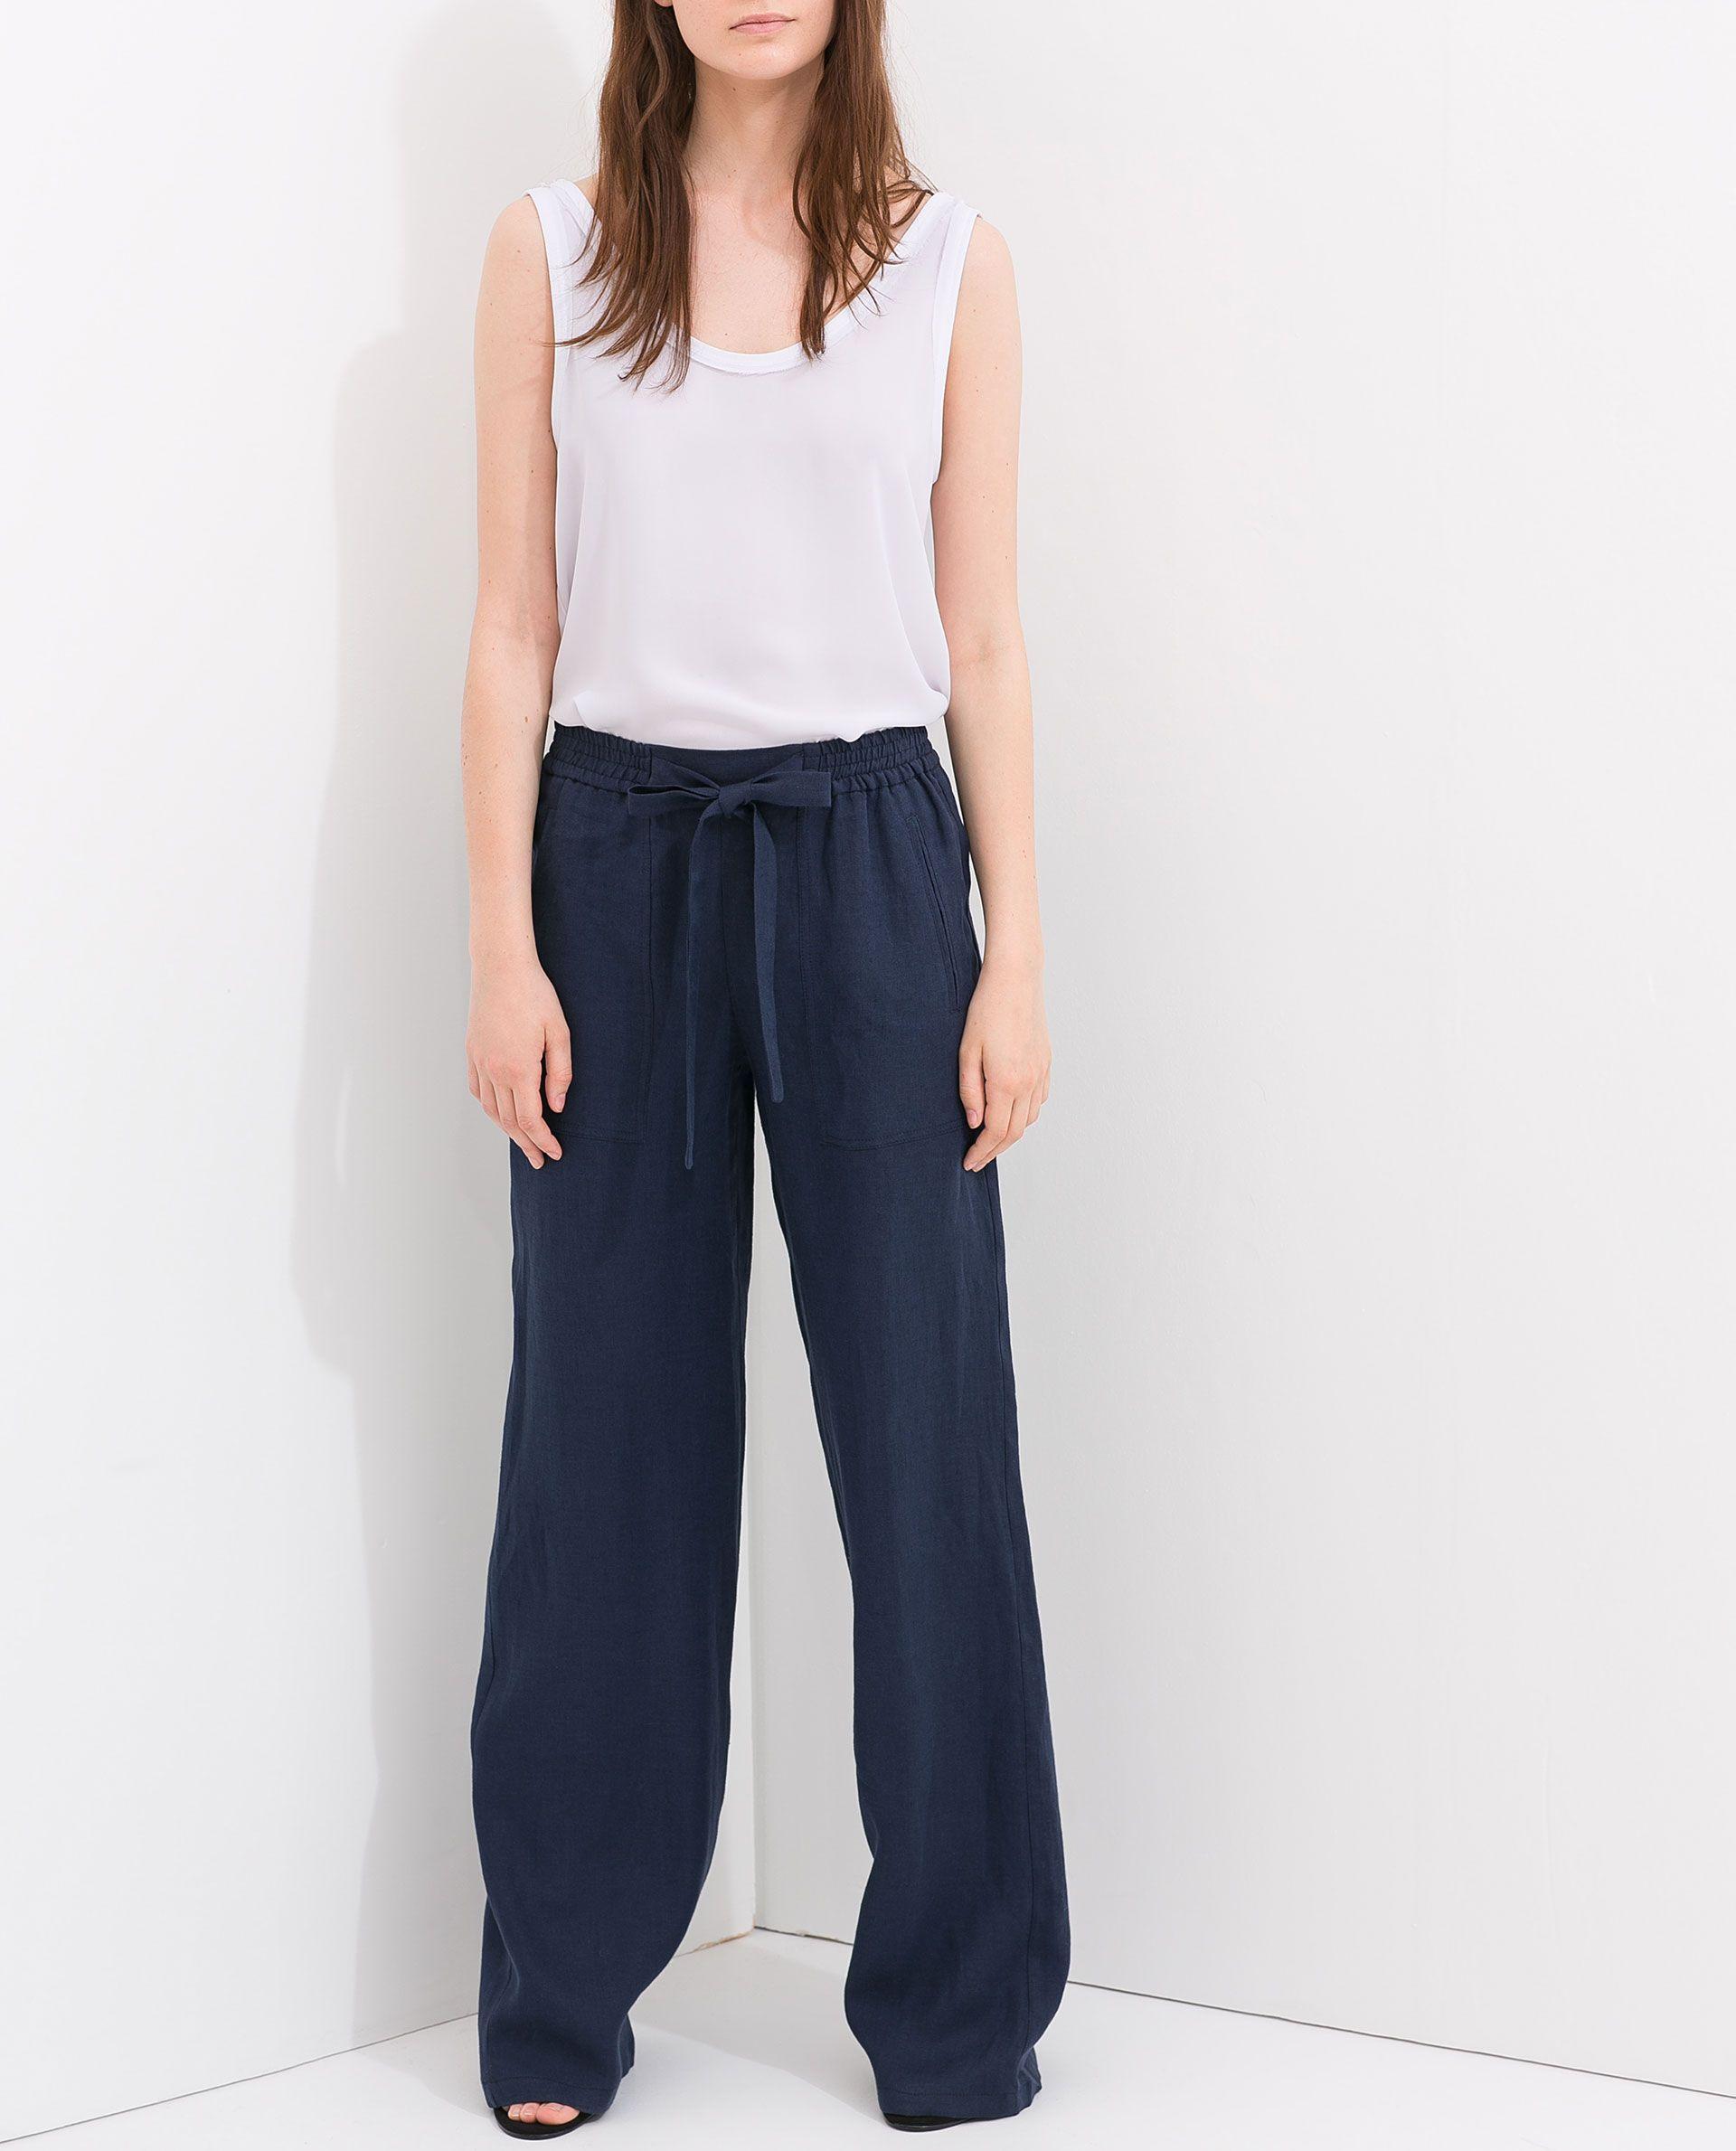 pantalon lin taille lastiqu e et ceinture pantalons femme zara france mapping. Black Bedroom Furniture Sets. Home Design Ideas